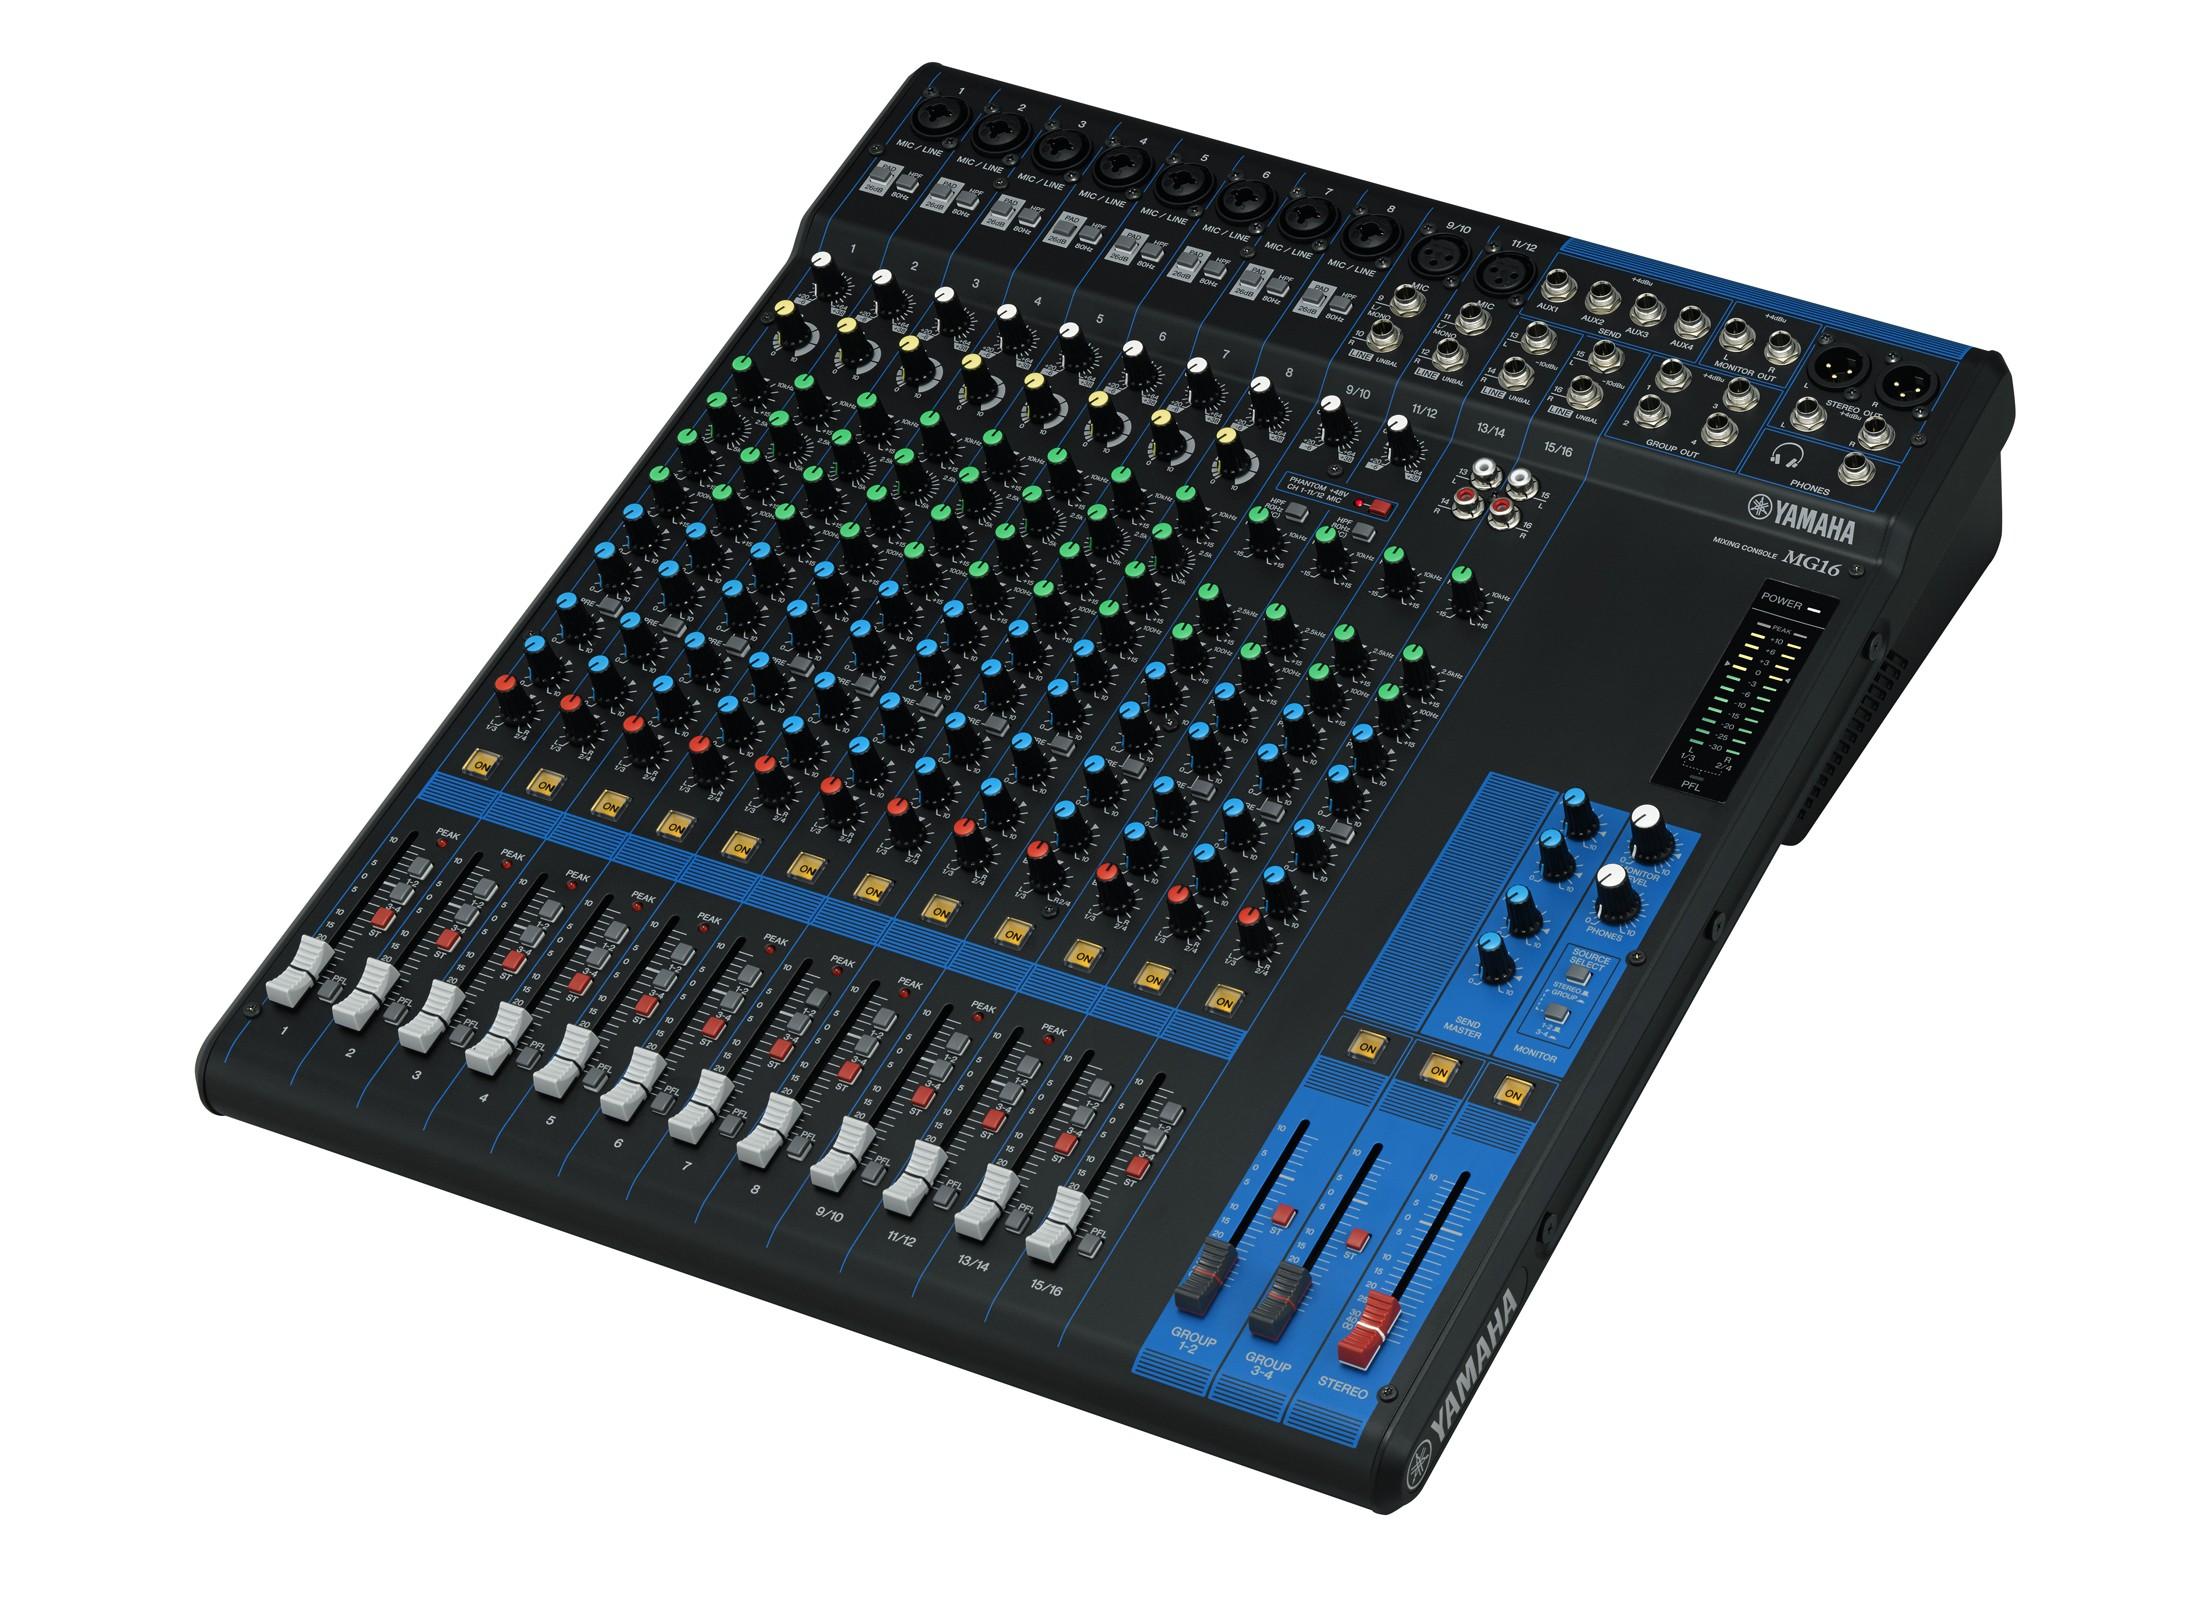 Yamaha Mg 16 Mixer Online At Low Prices At Huss Light Amp Sound